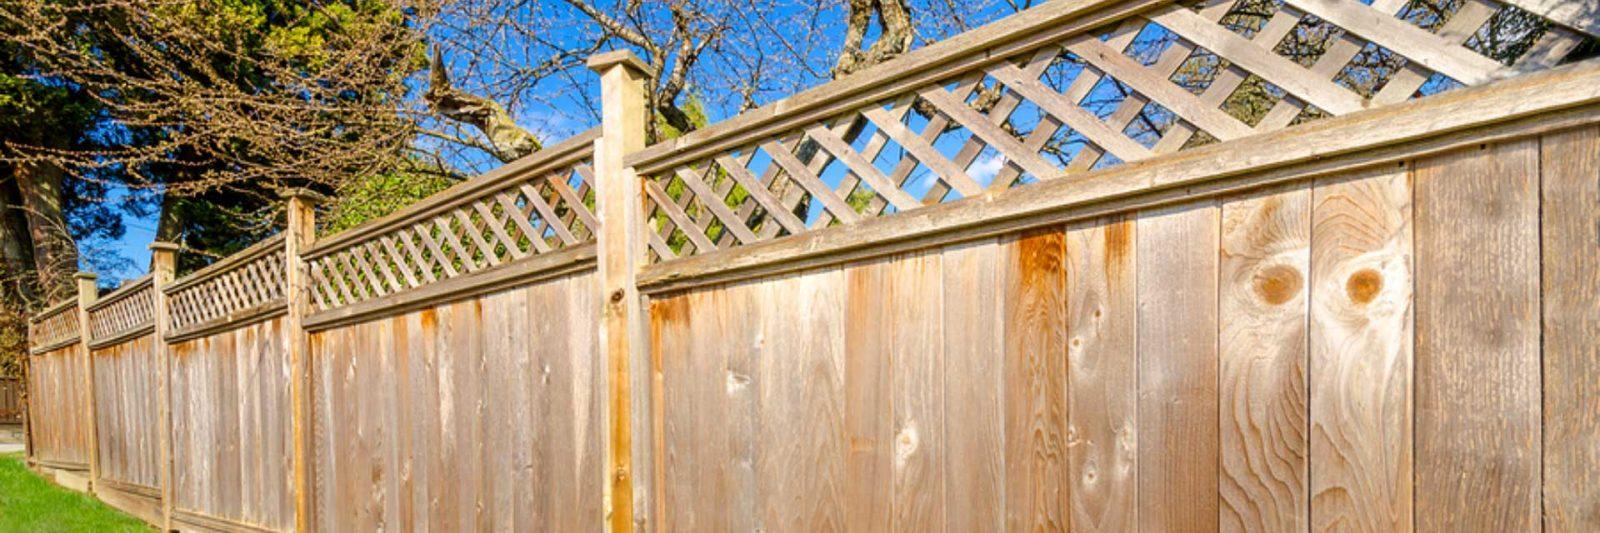 Pro Pavers Fences